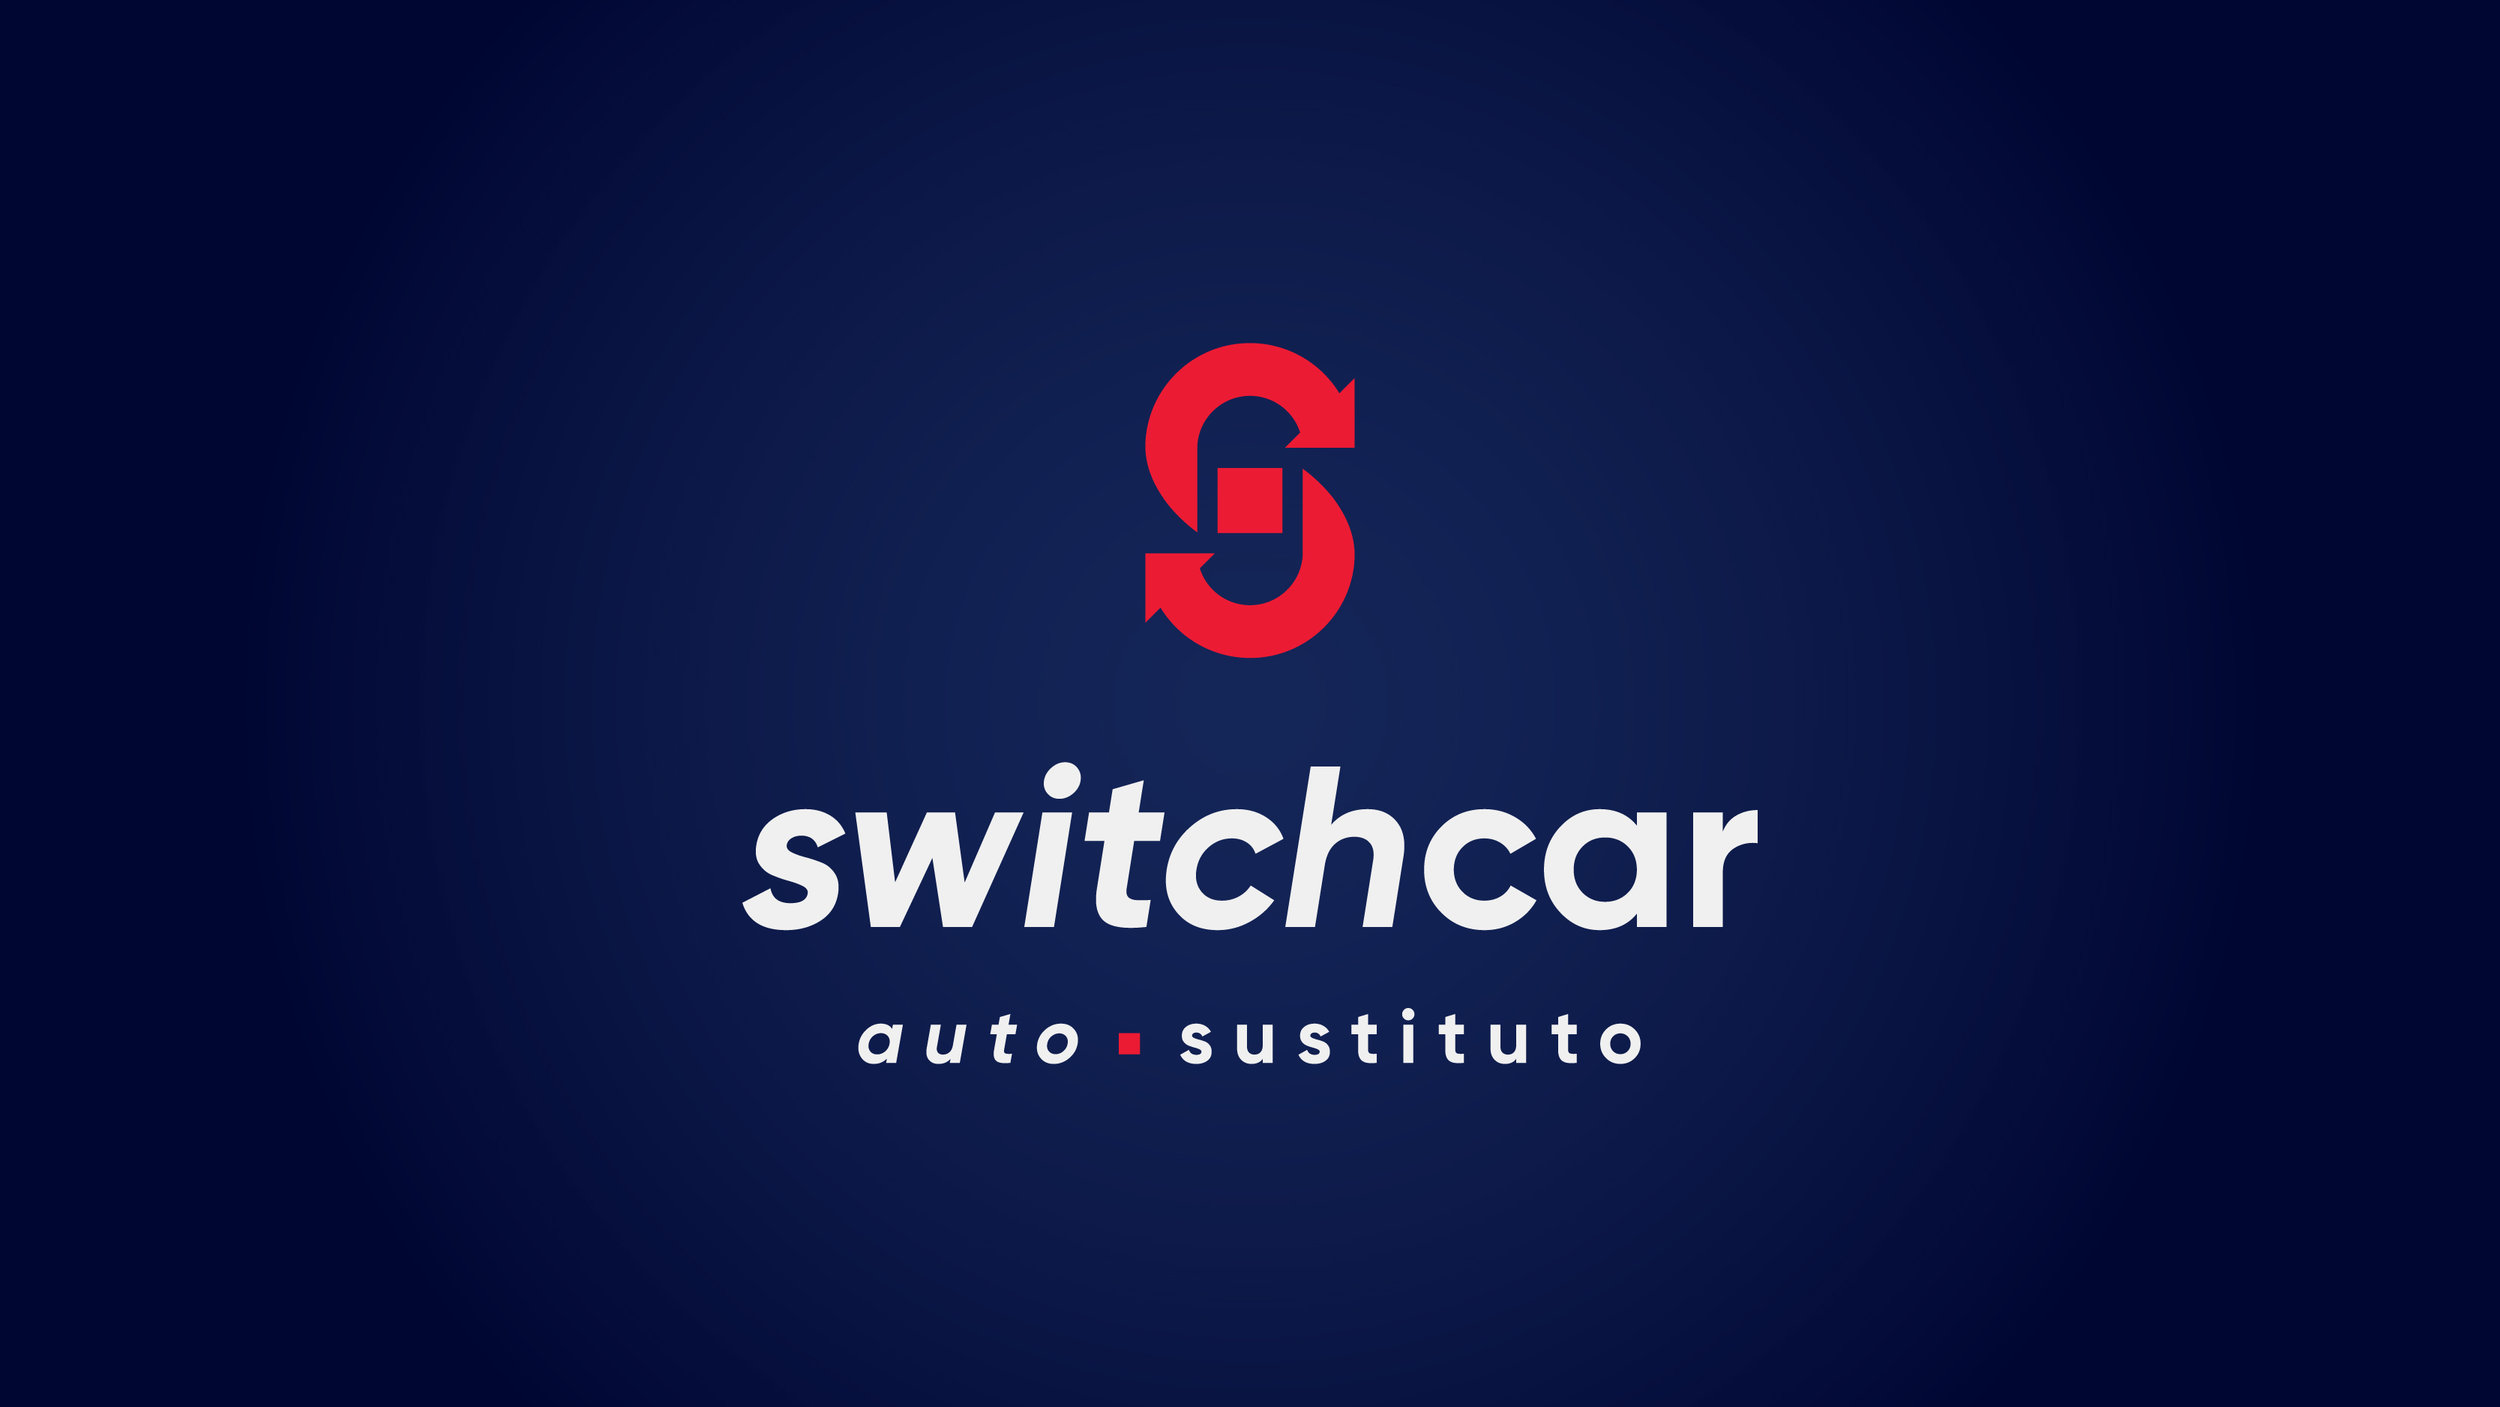 Switchcar - Presentación-01.jpg